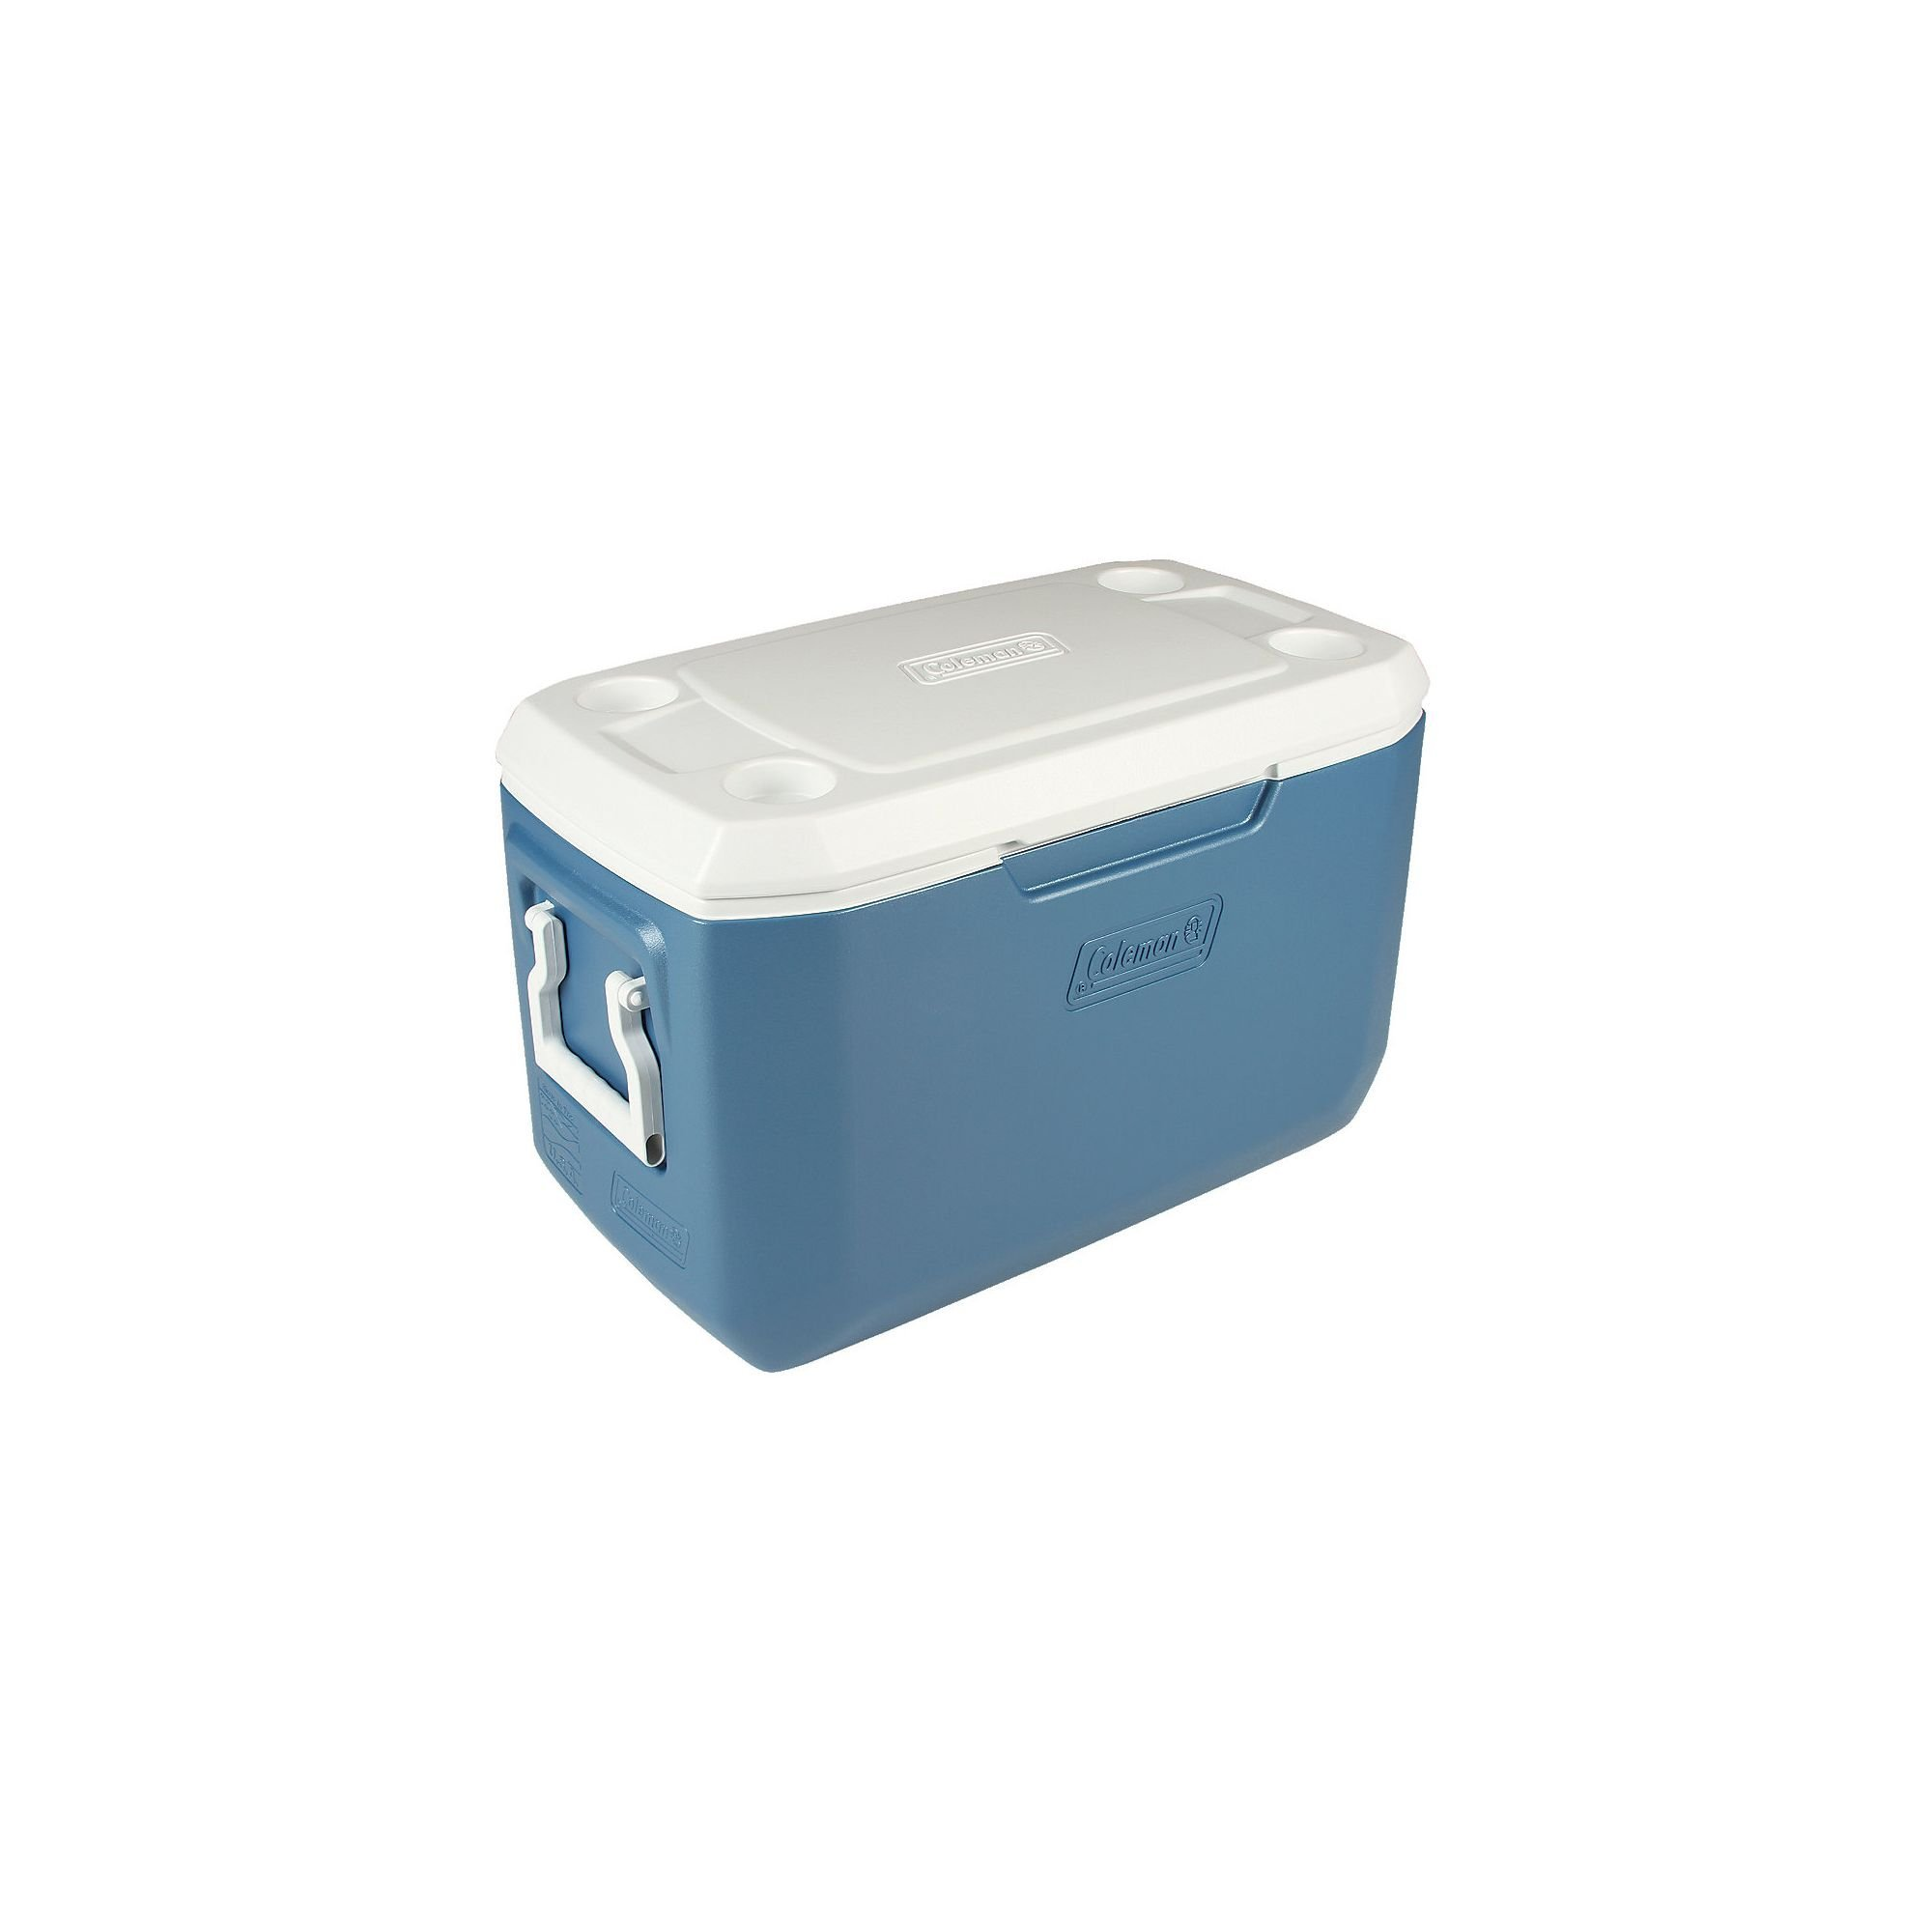 Coleman 70-Quart Xtreme 5-Day Heavy-Duty Cooler, Blue